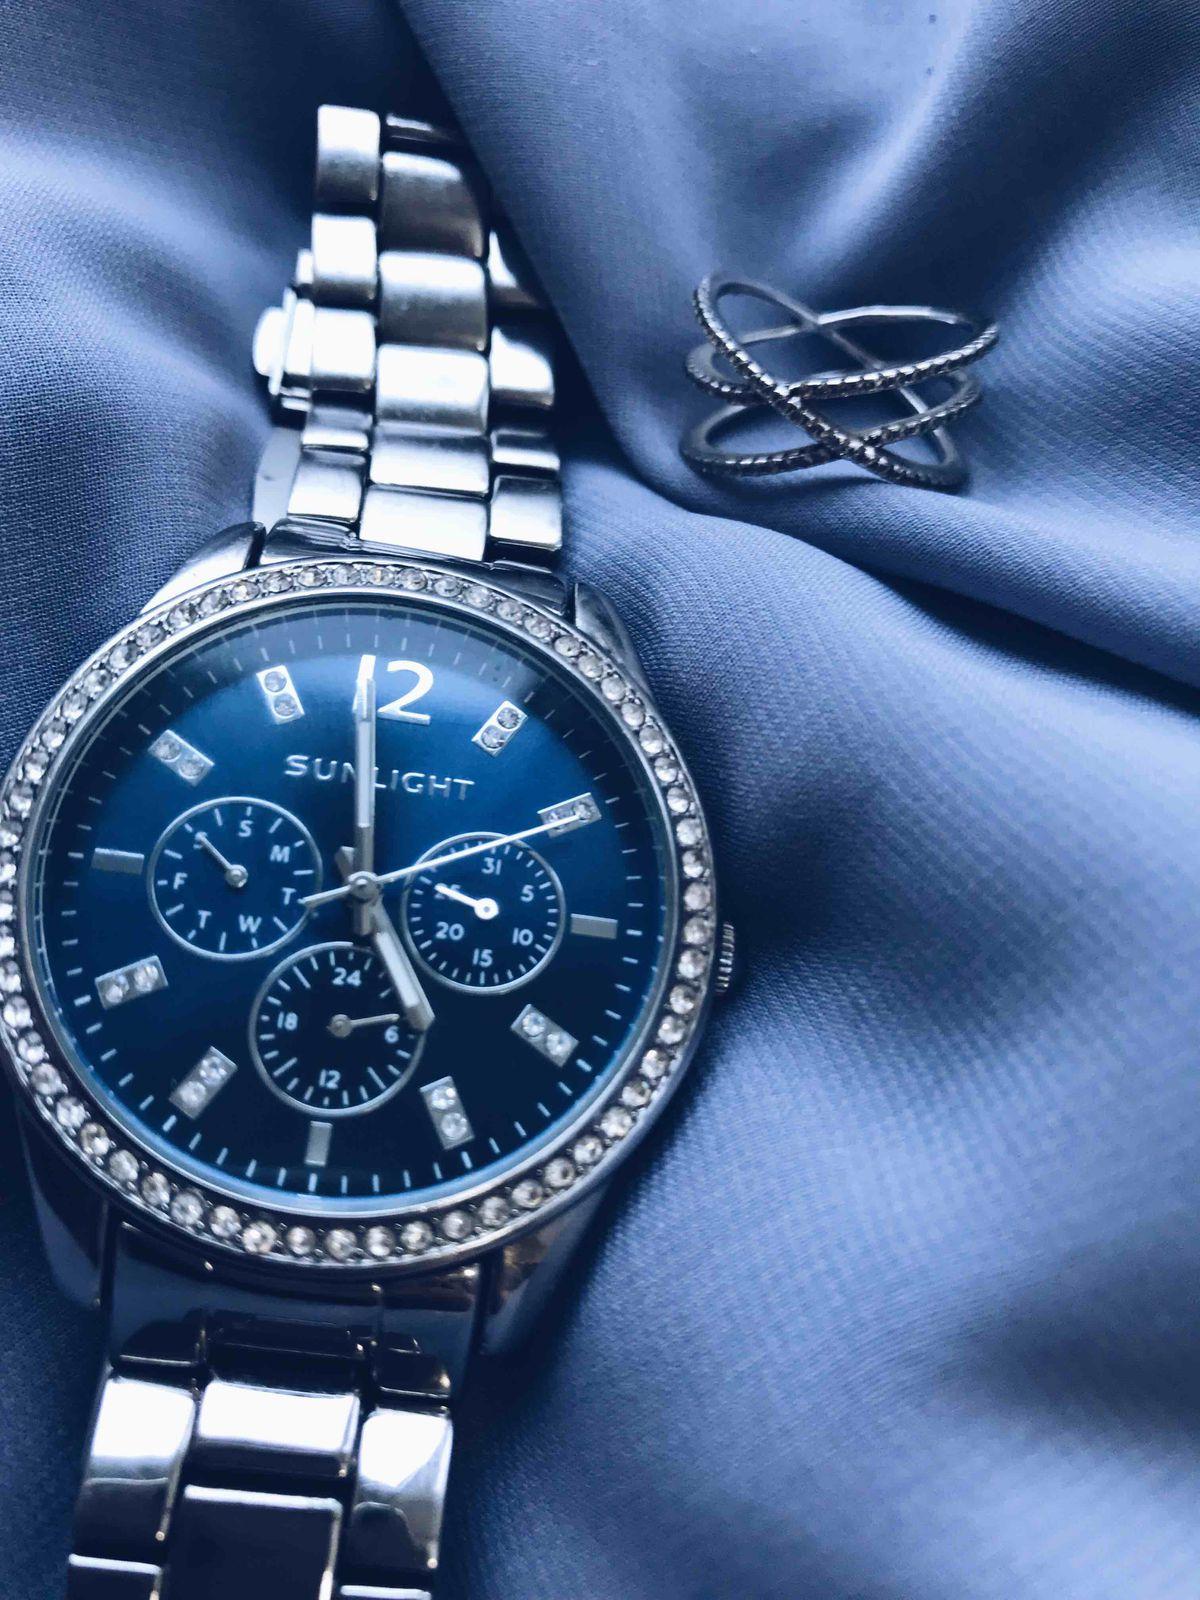 Крутые часы за минимальную цену!